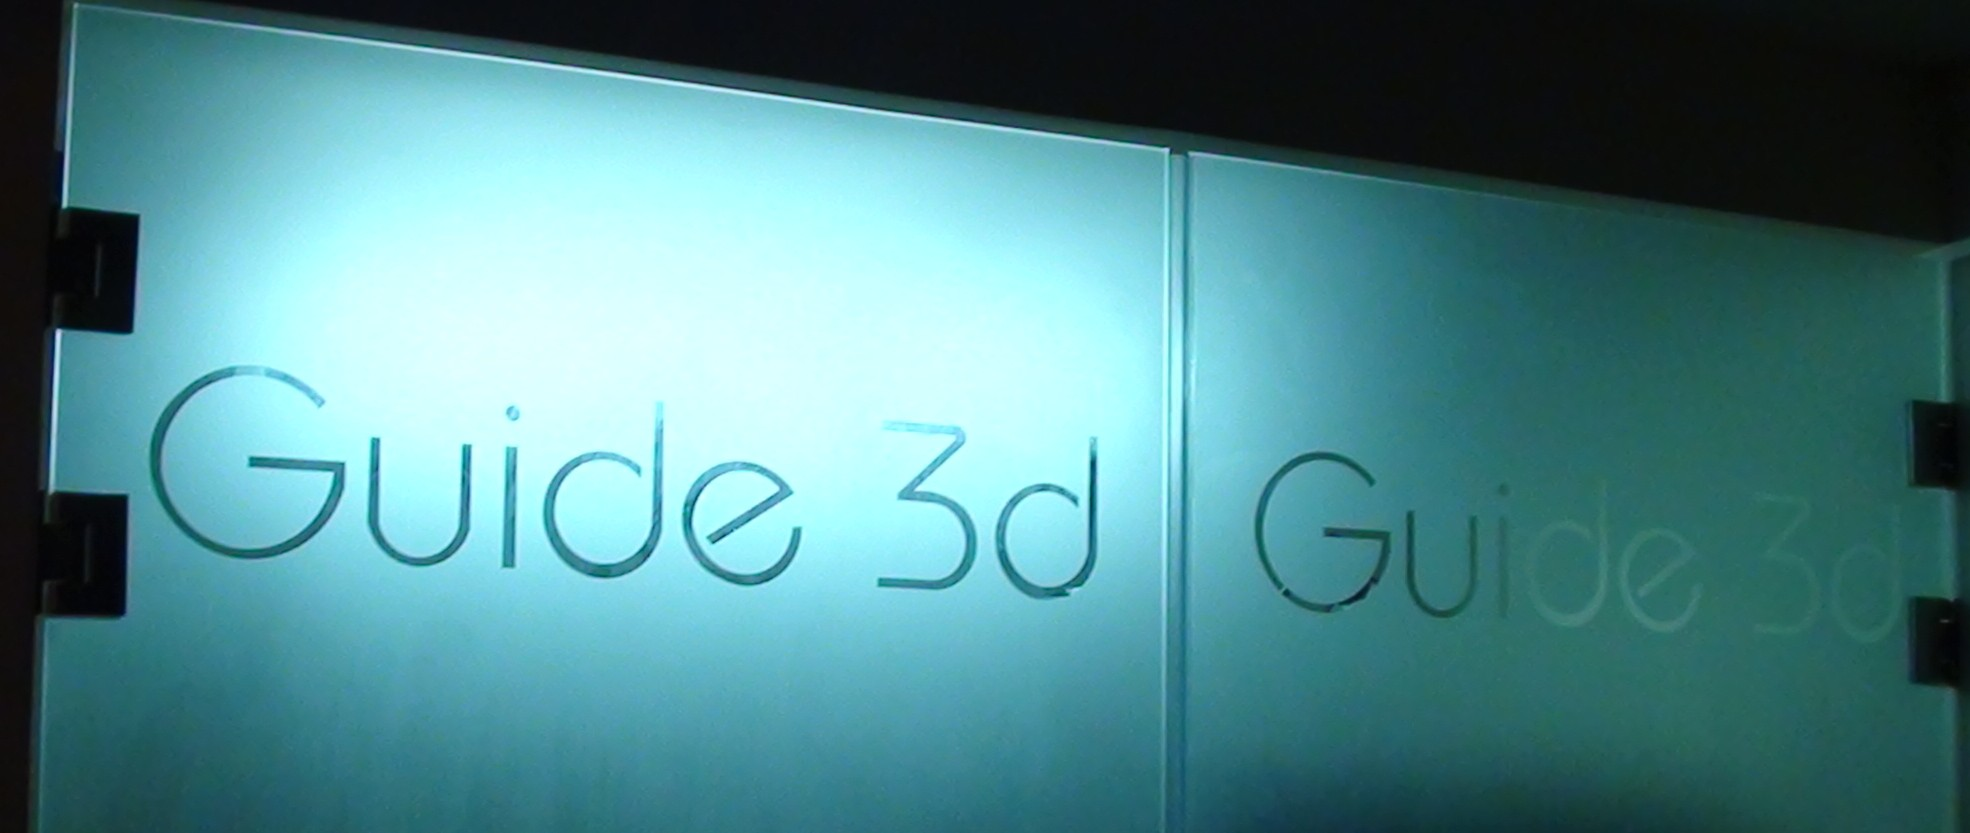 Guide3d Lab